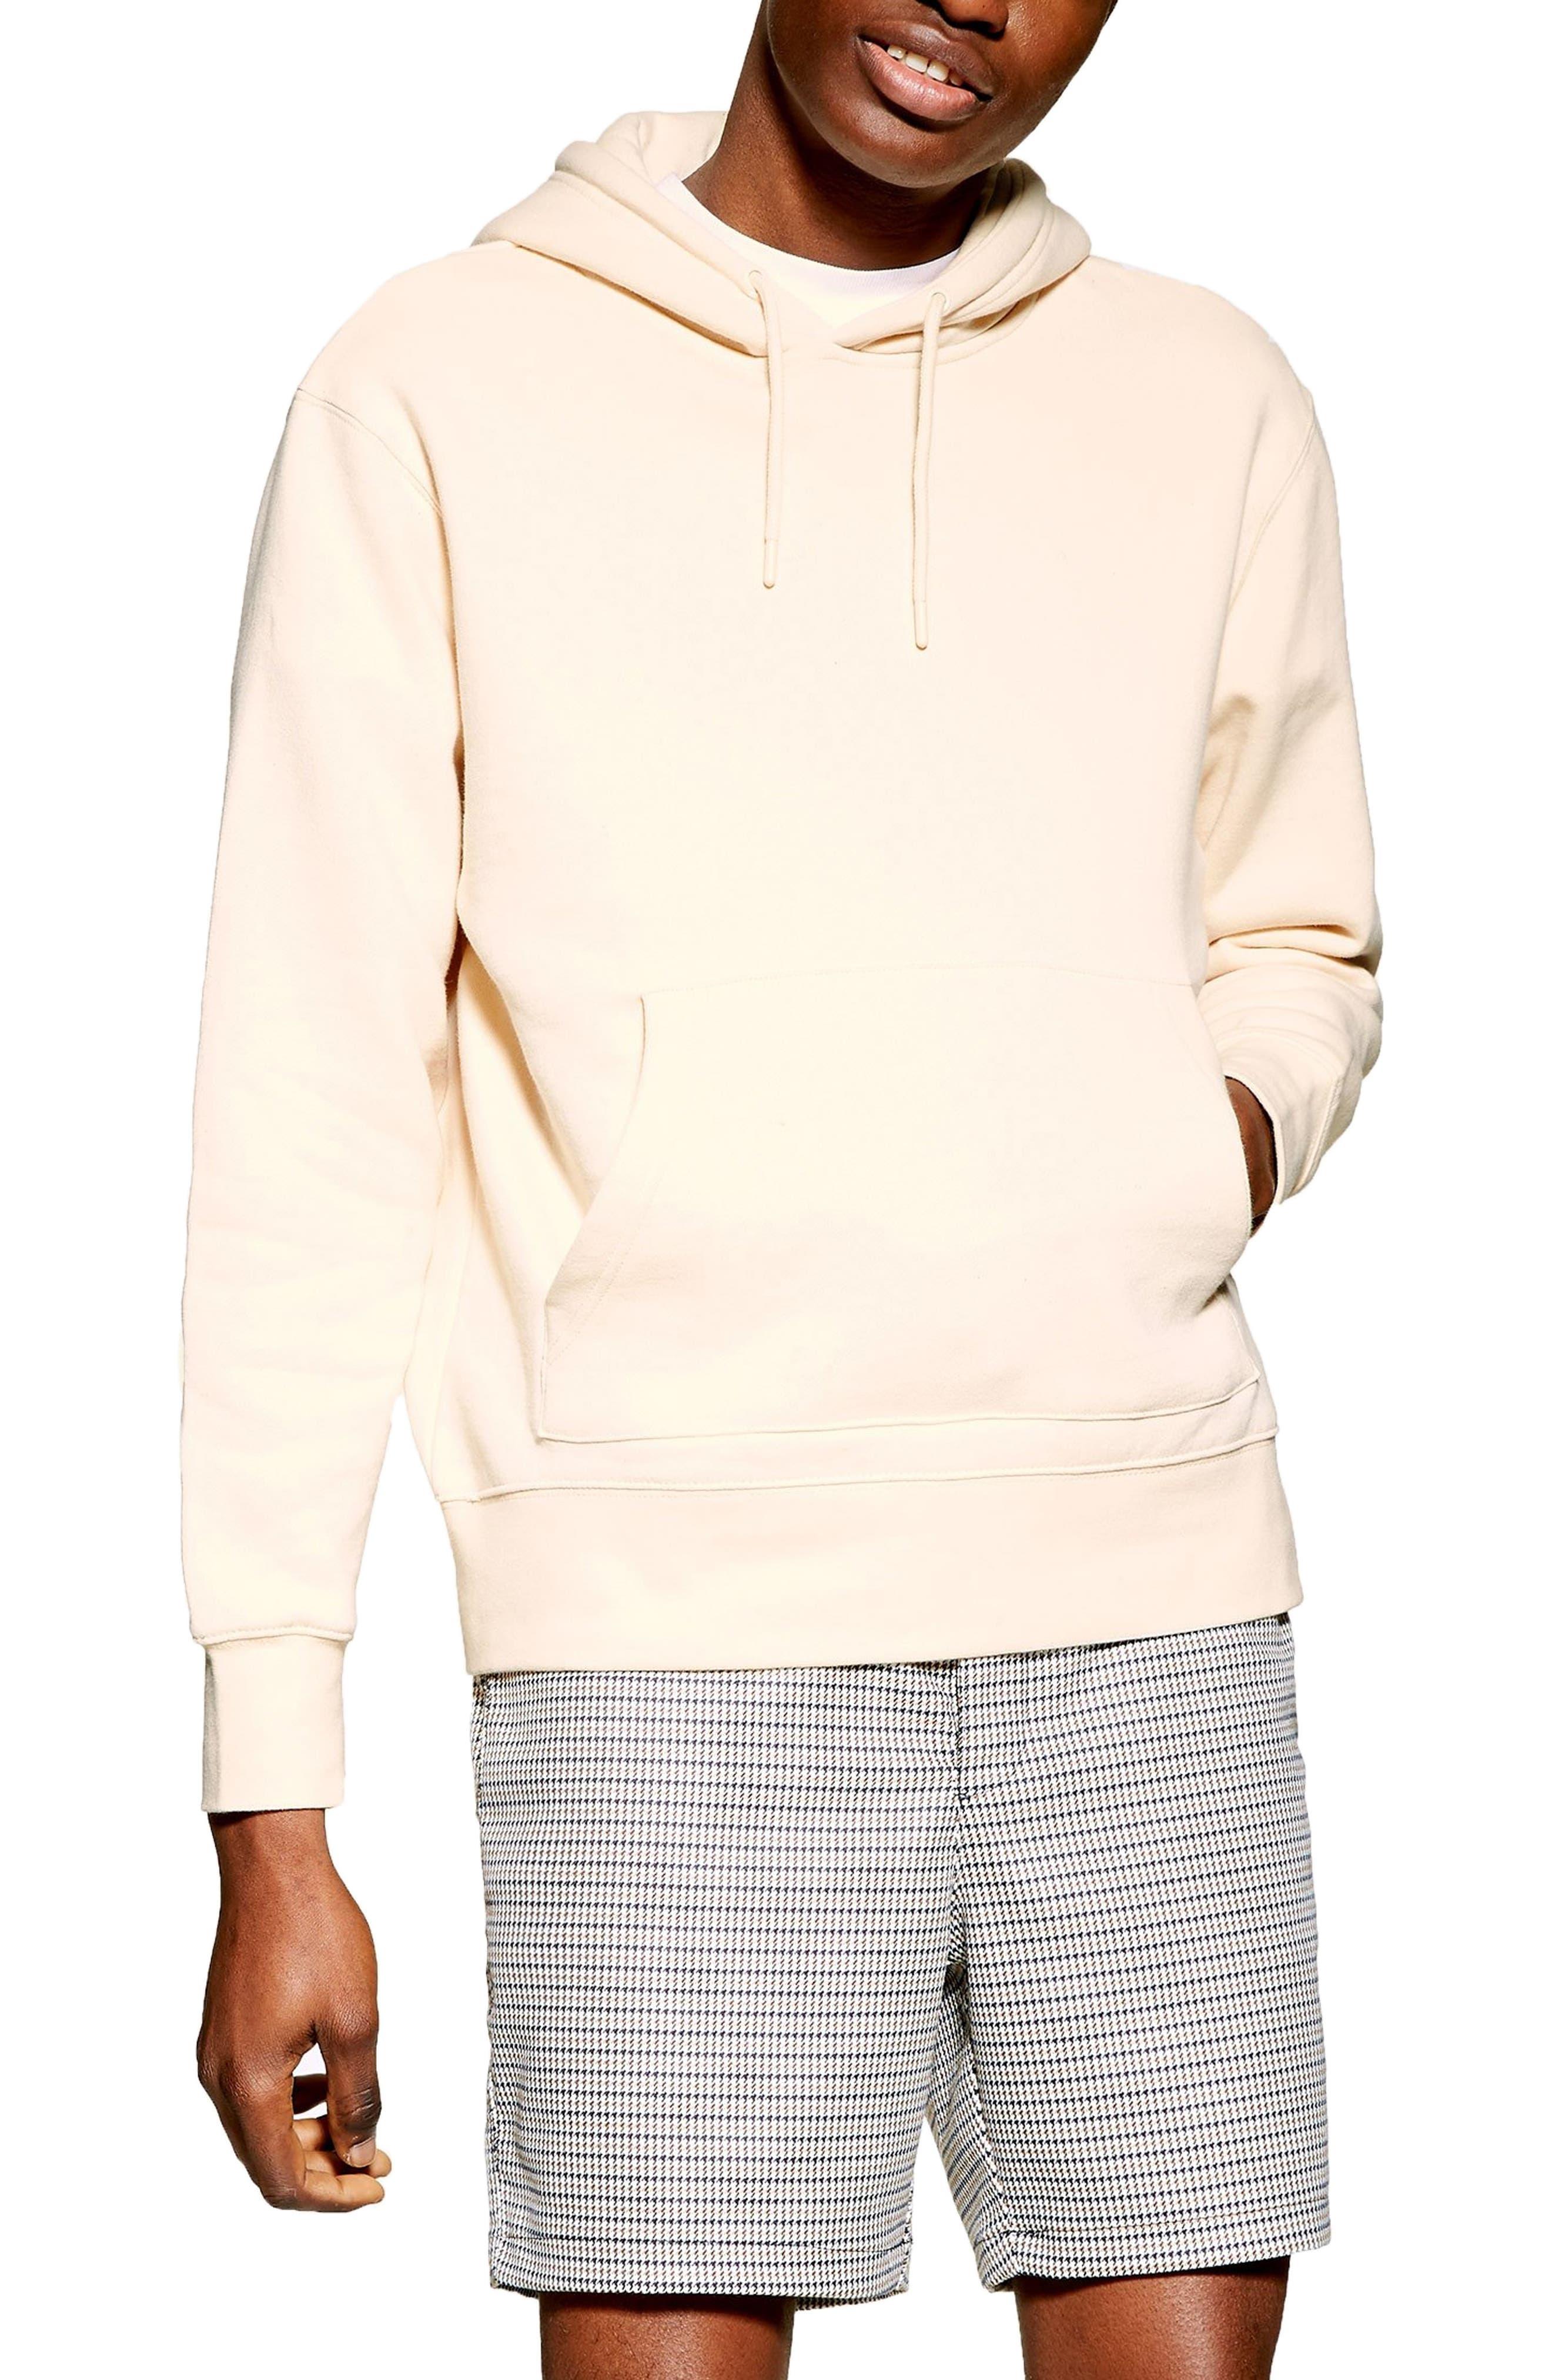 TOPMAN, Tristan Hooded Sweatshirt, Main thumbnail 1, color, STONE